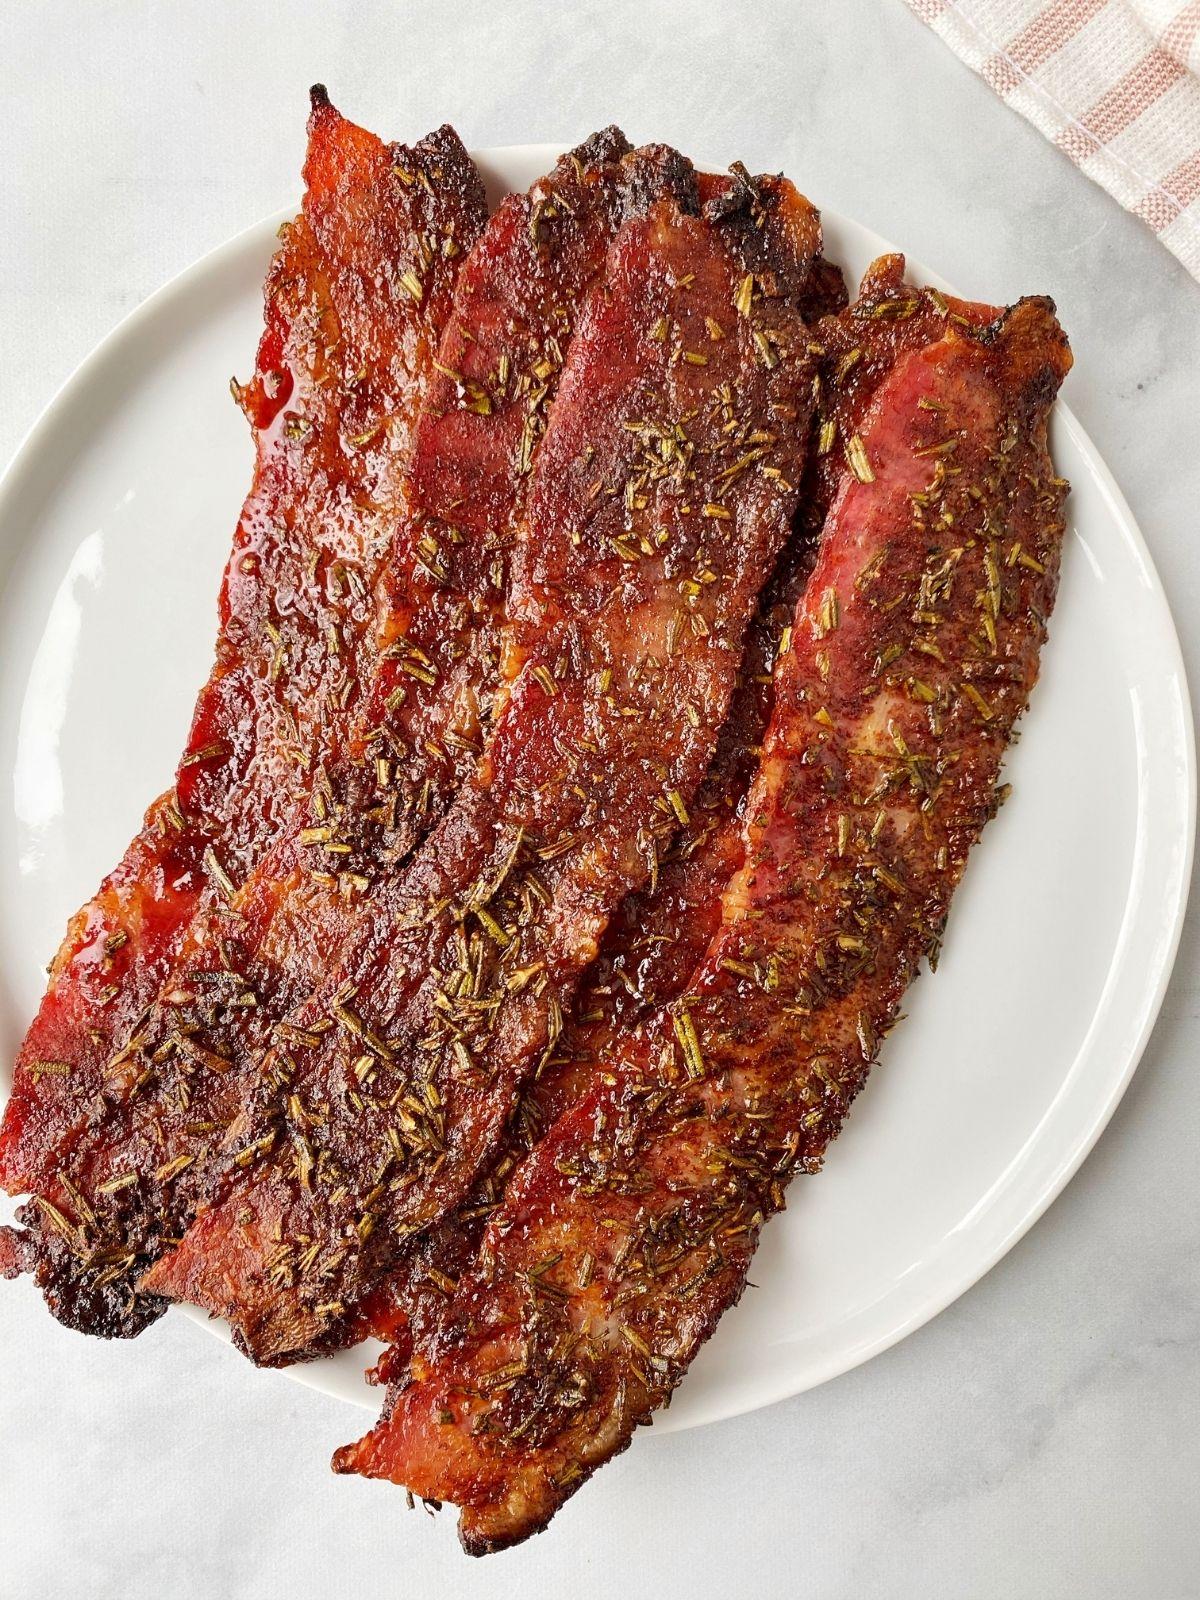 seasoned bacon piled on a white plate